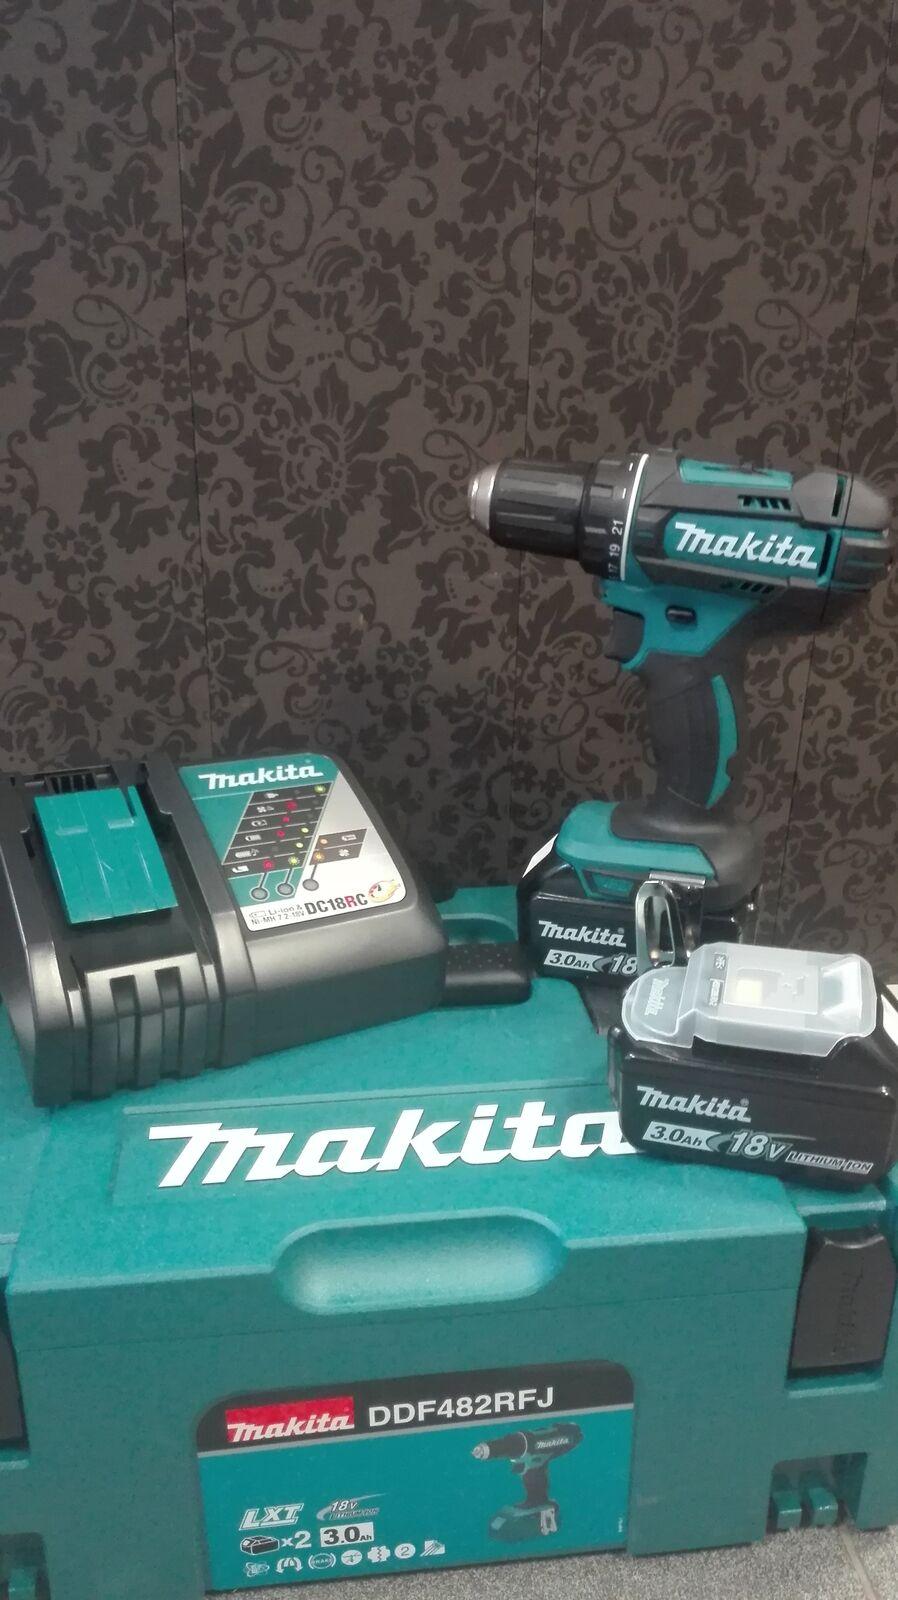 Makita Akku-Bohrschrauber DDF482RFJ 18 V 2 x 3,0 Ah Akkus + Ladegerät